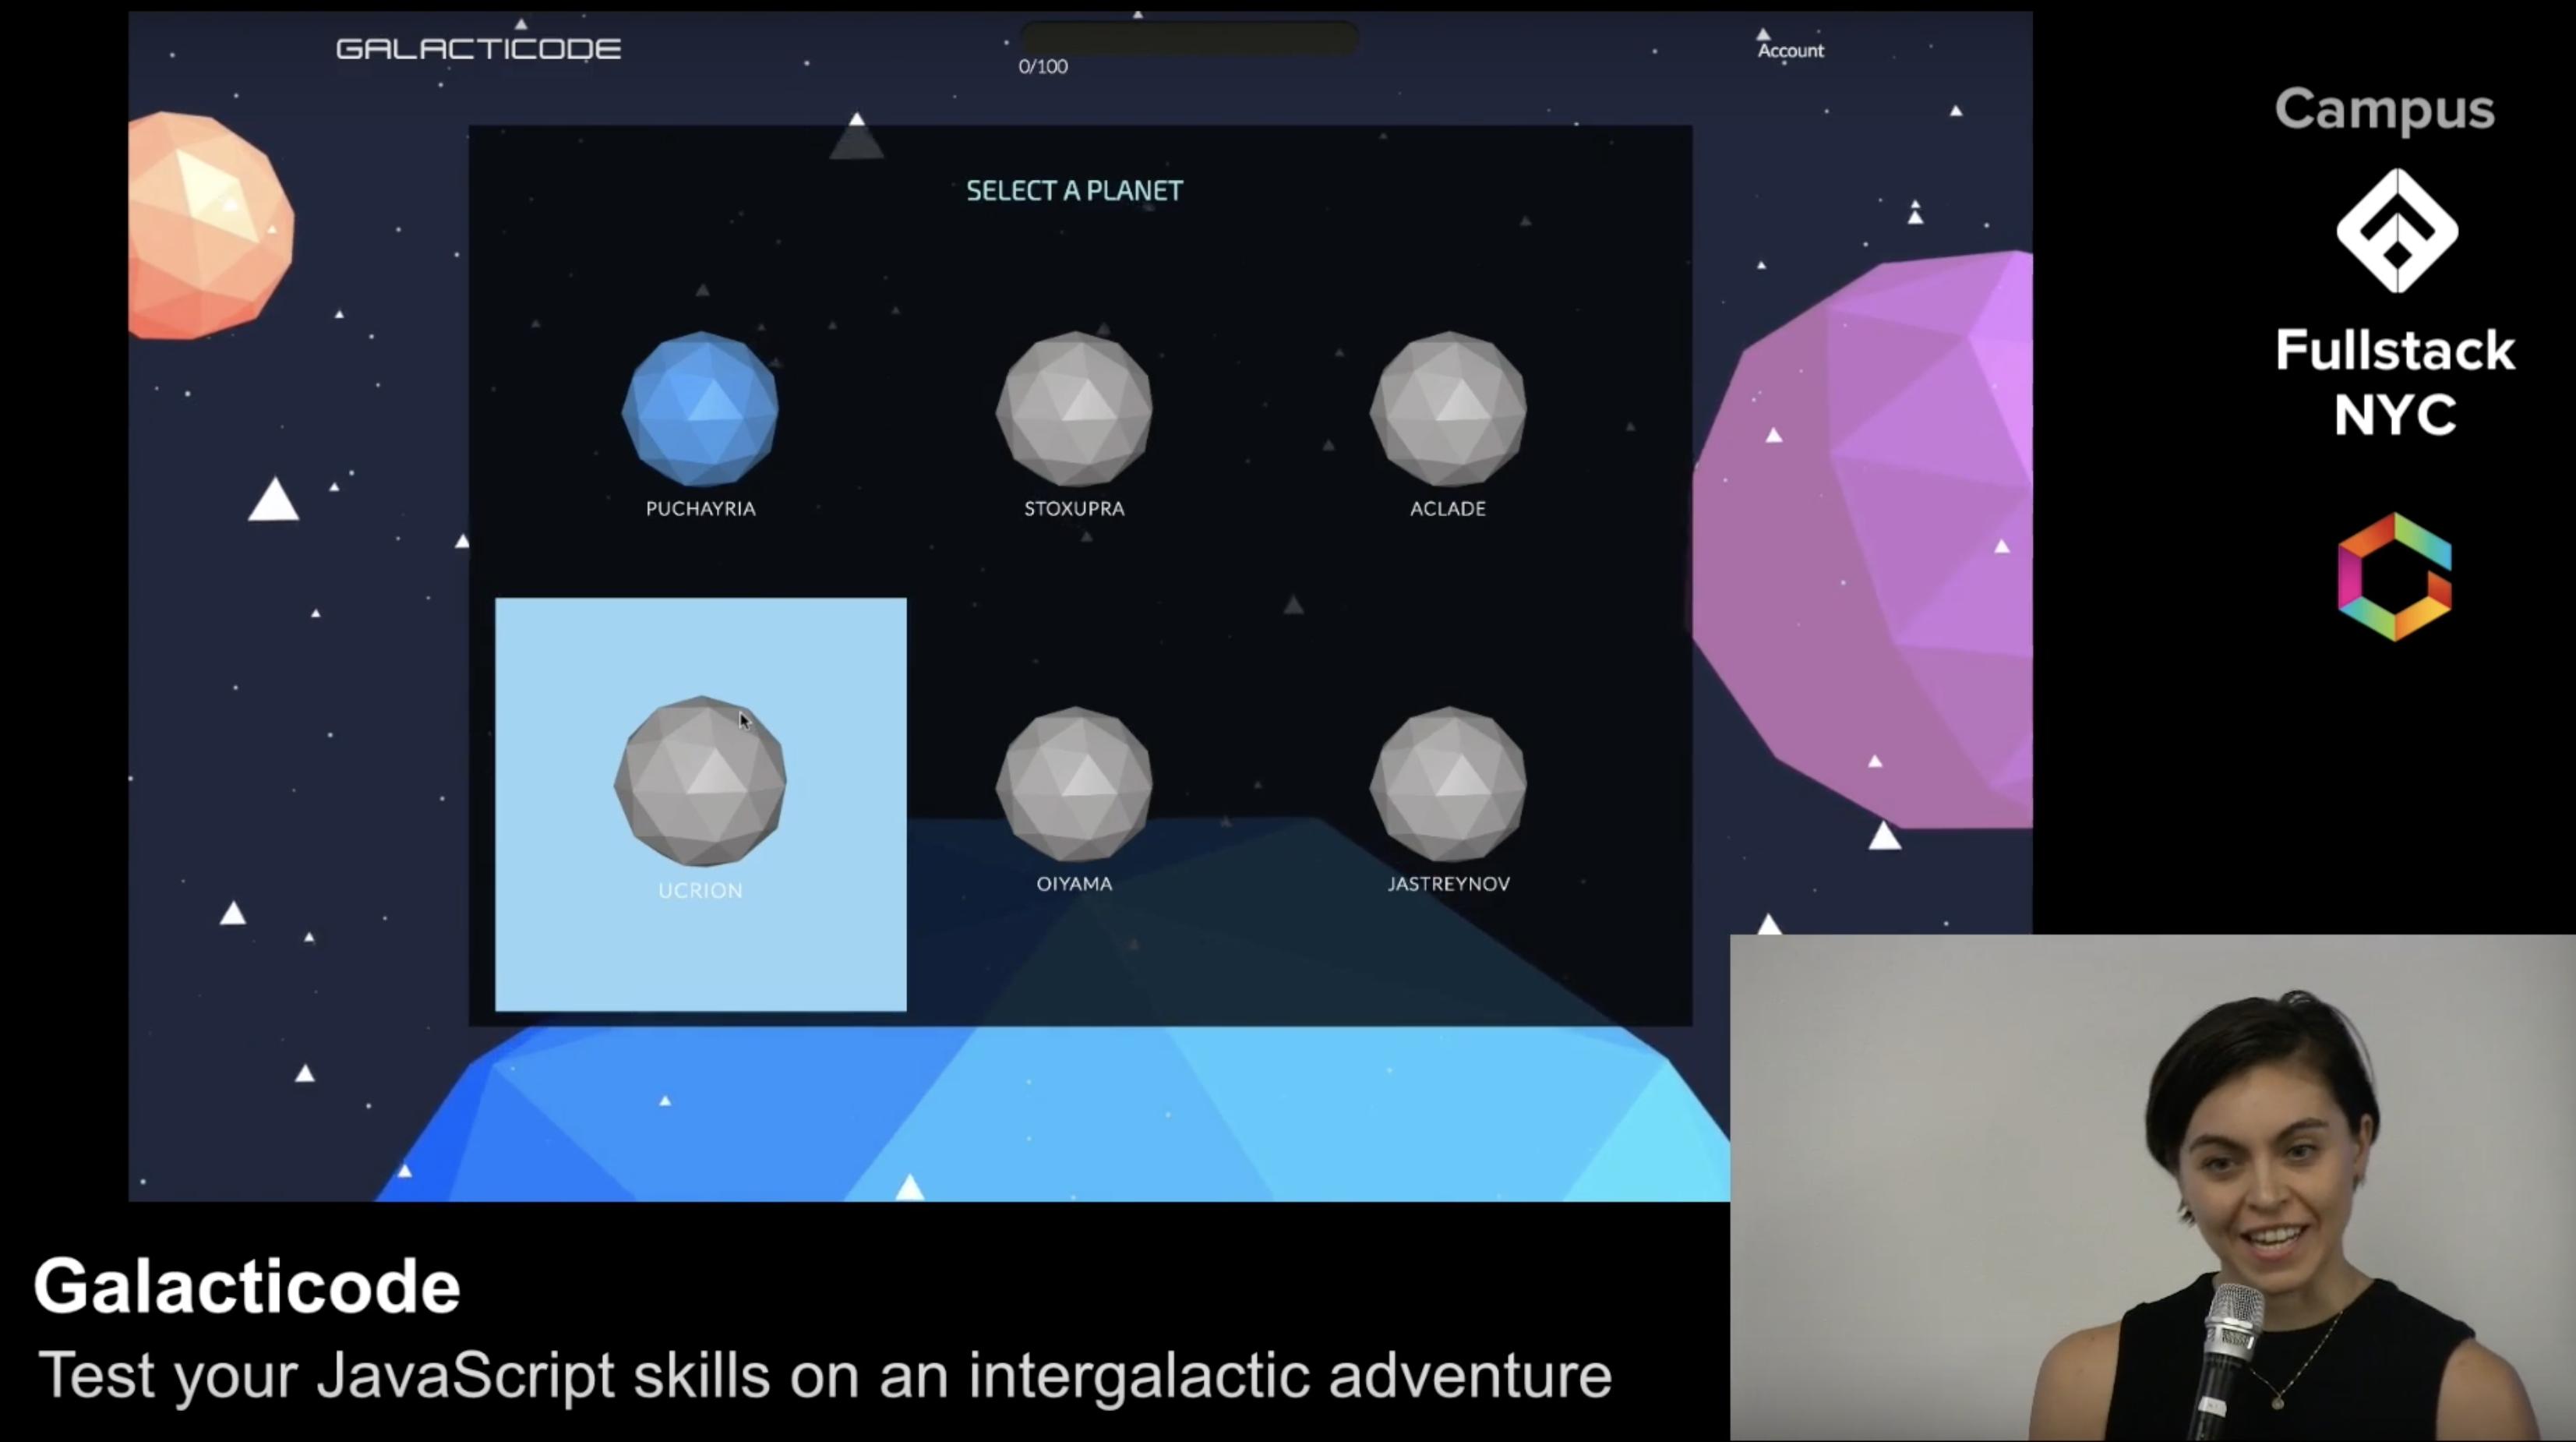 Galacticode | Fullstack Academy